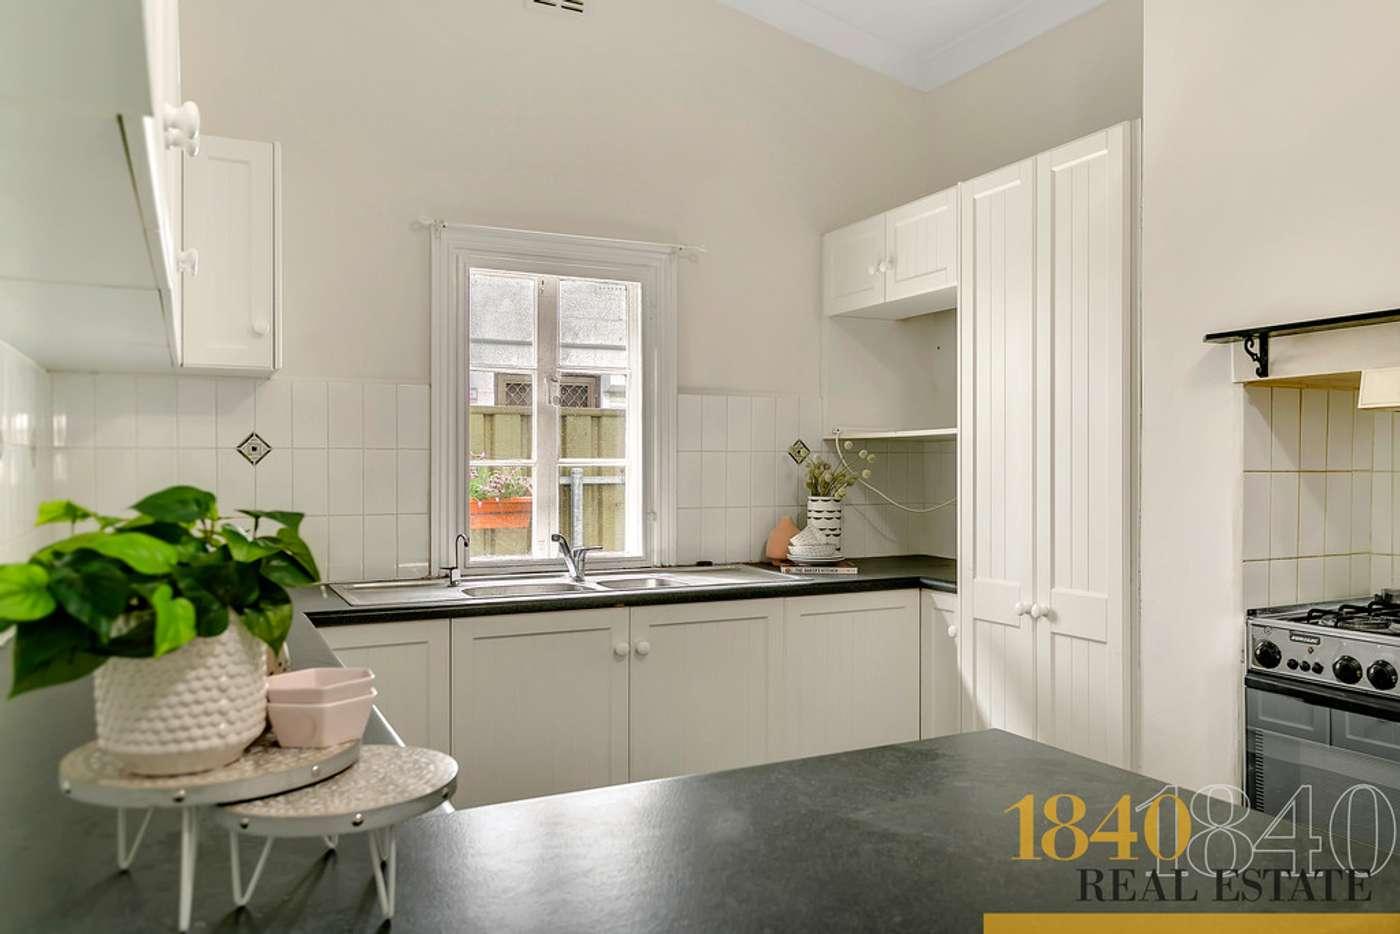 Sixth view of Homely house listing, 121 Hawker Street, Ridleyton SA 5008